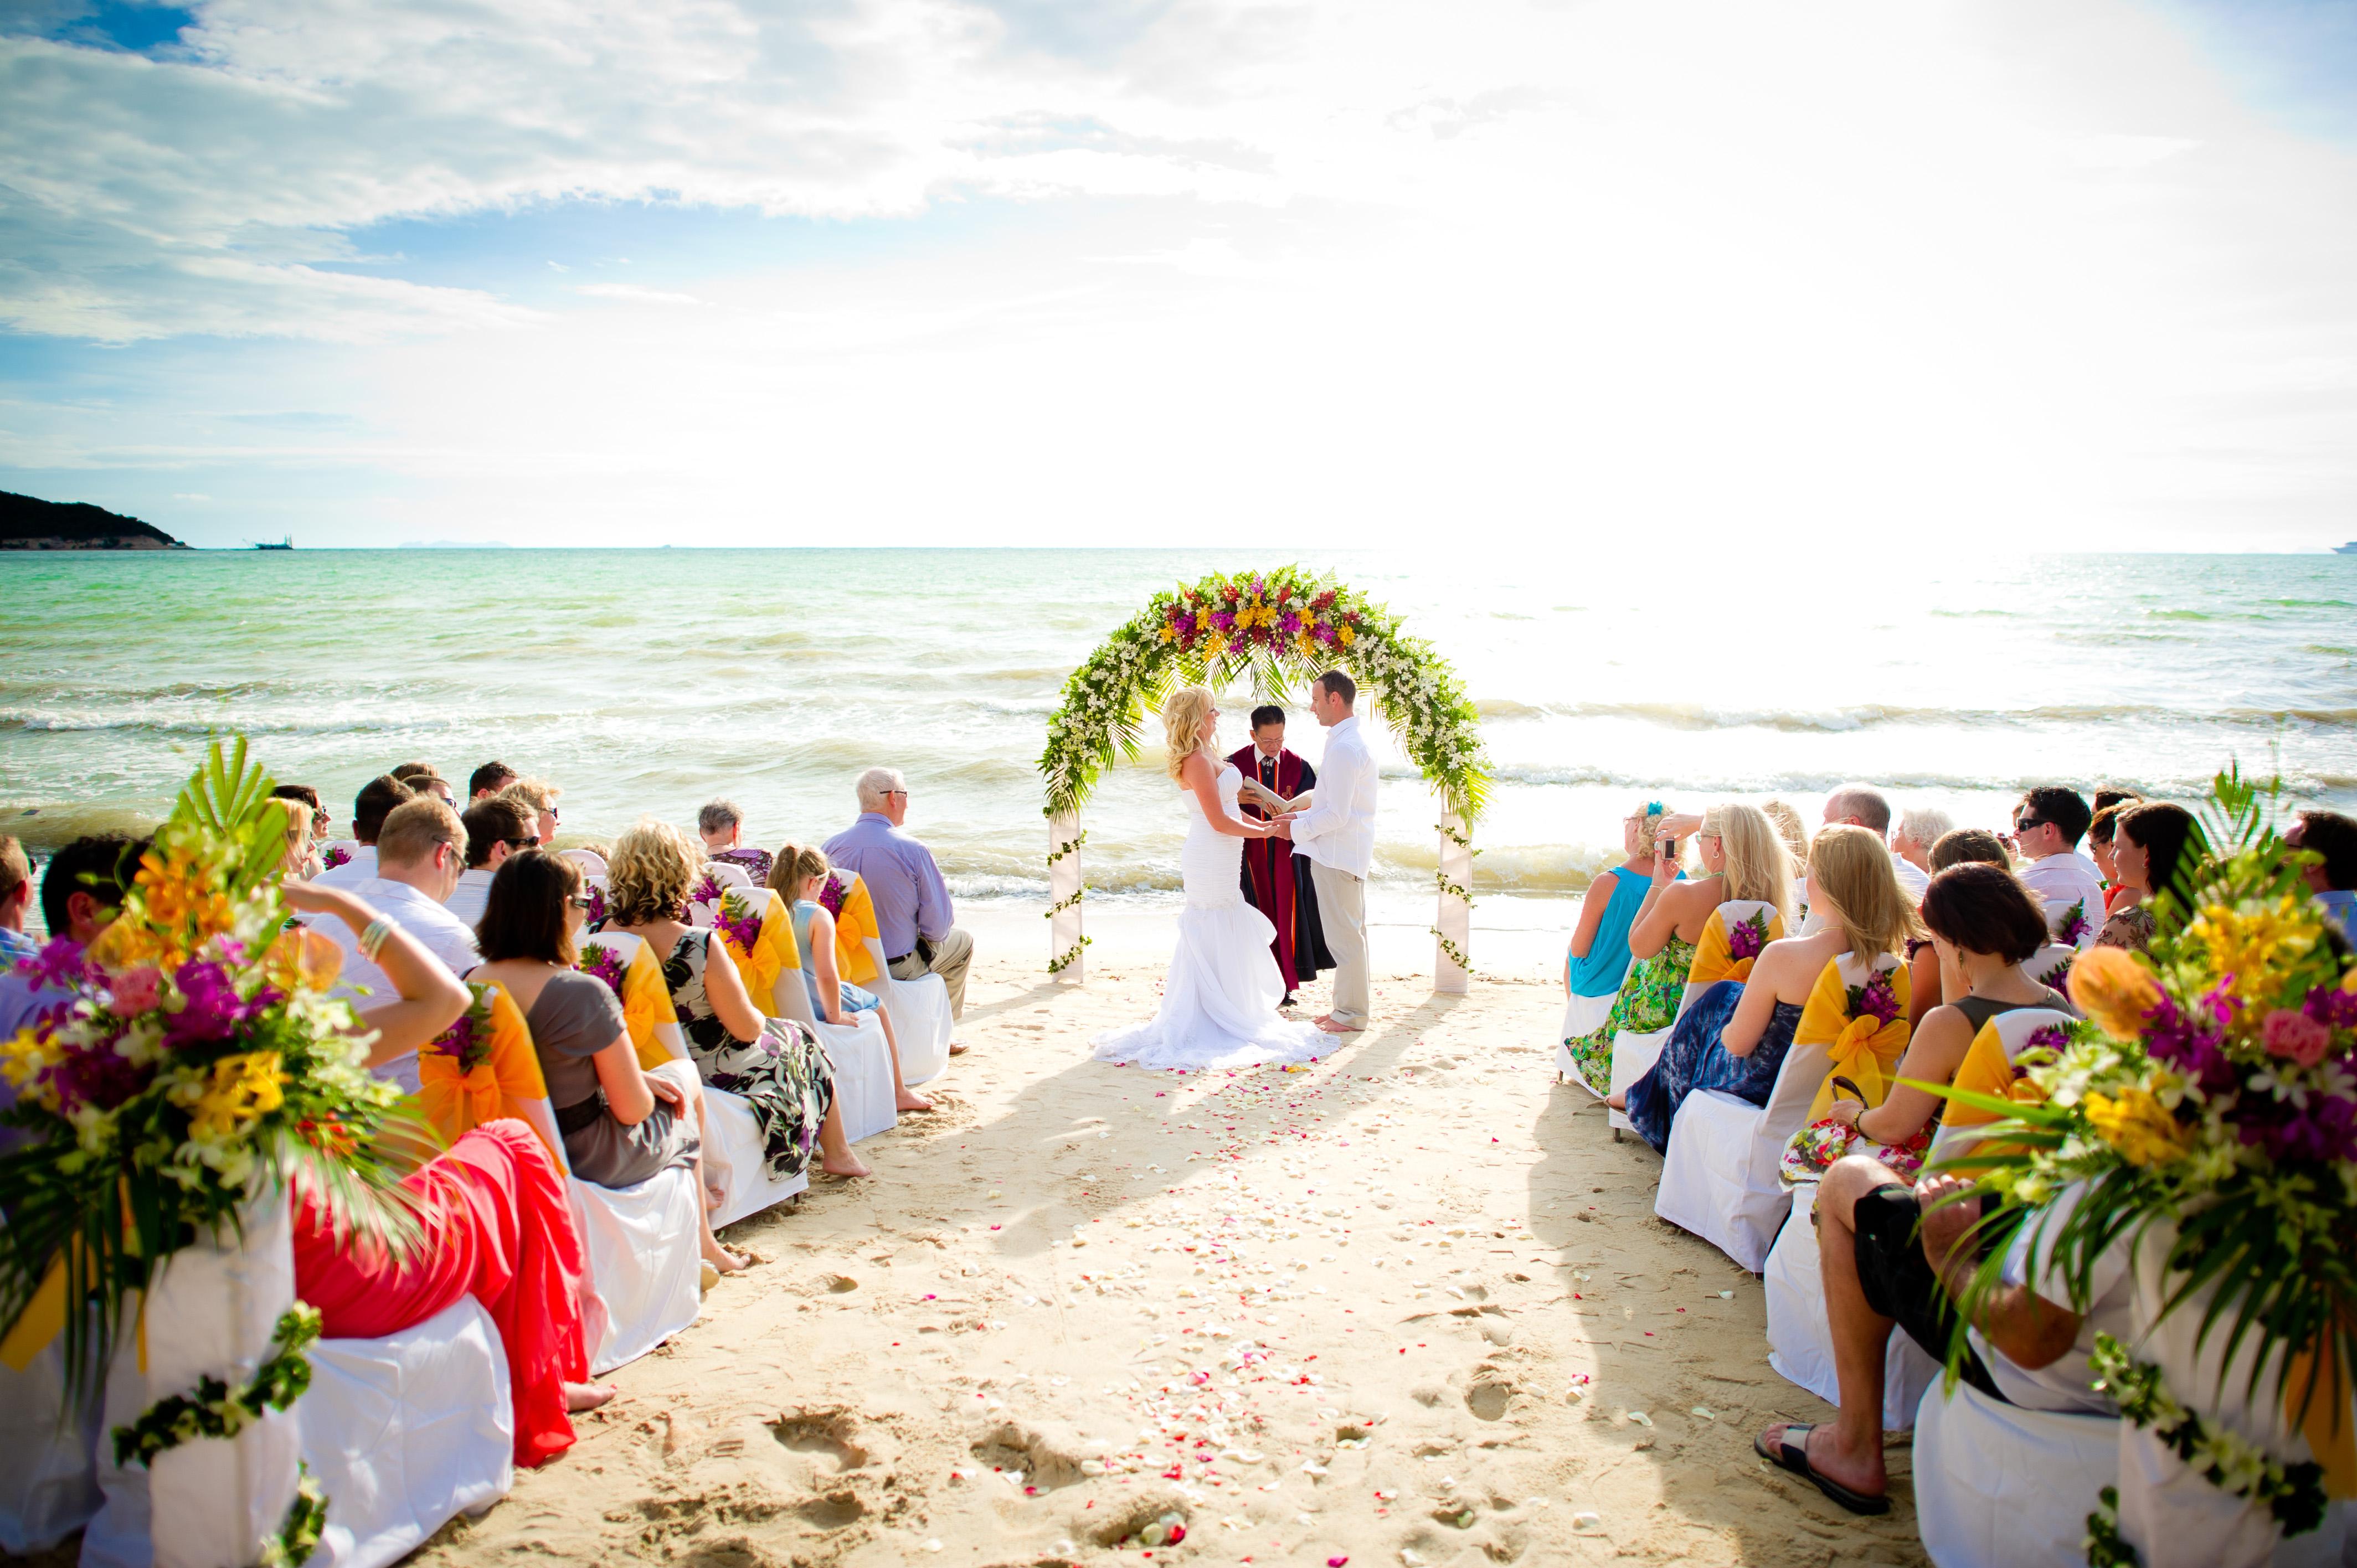 Koh Samui Thailand Wedding Photography: Lipa Lodge Resort Wedding